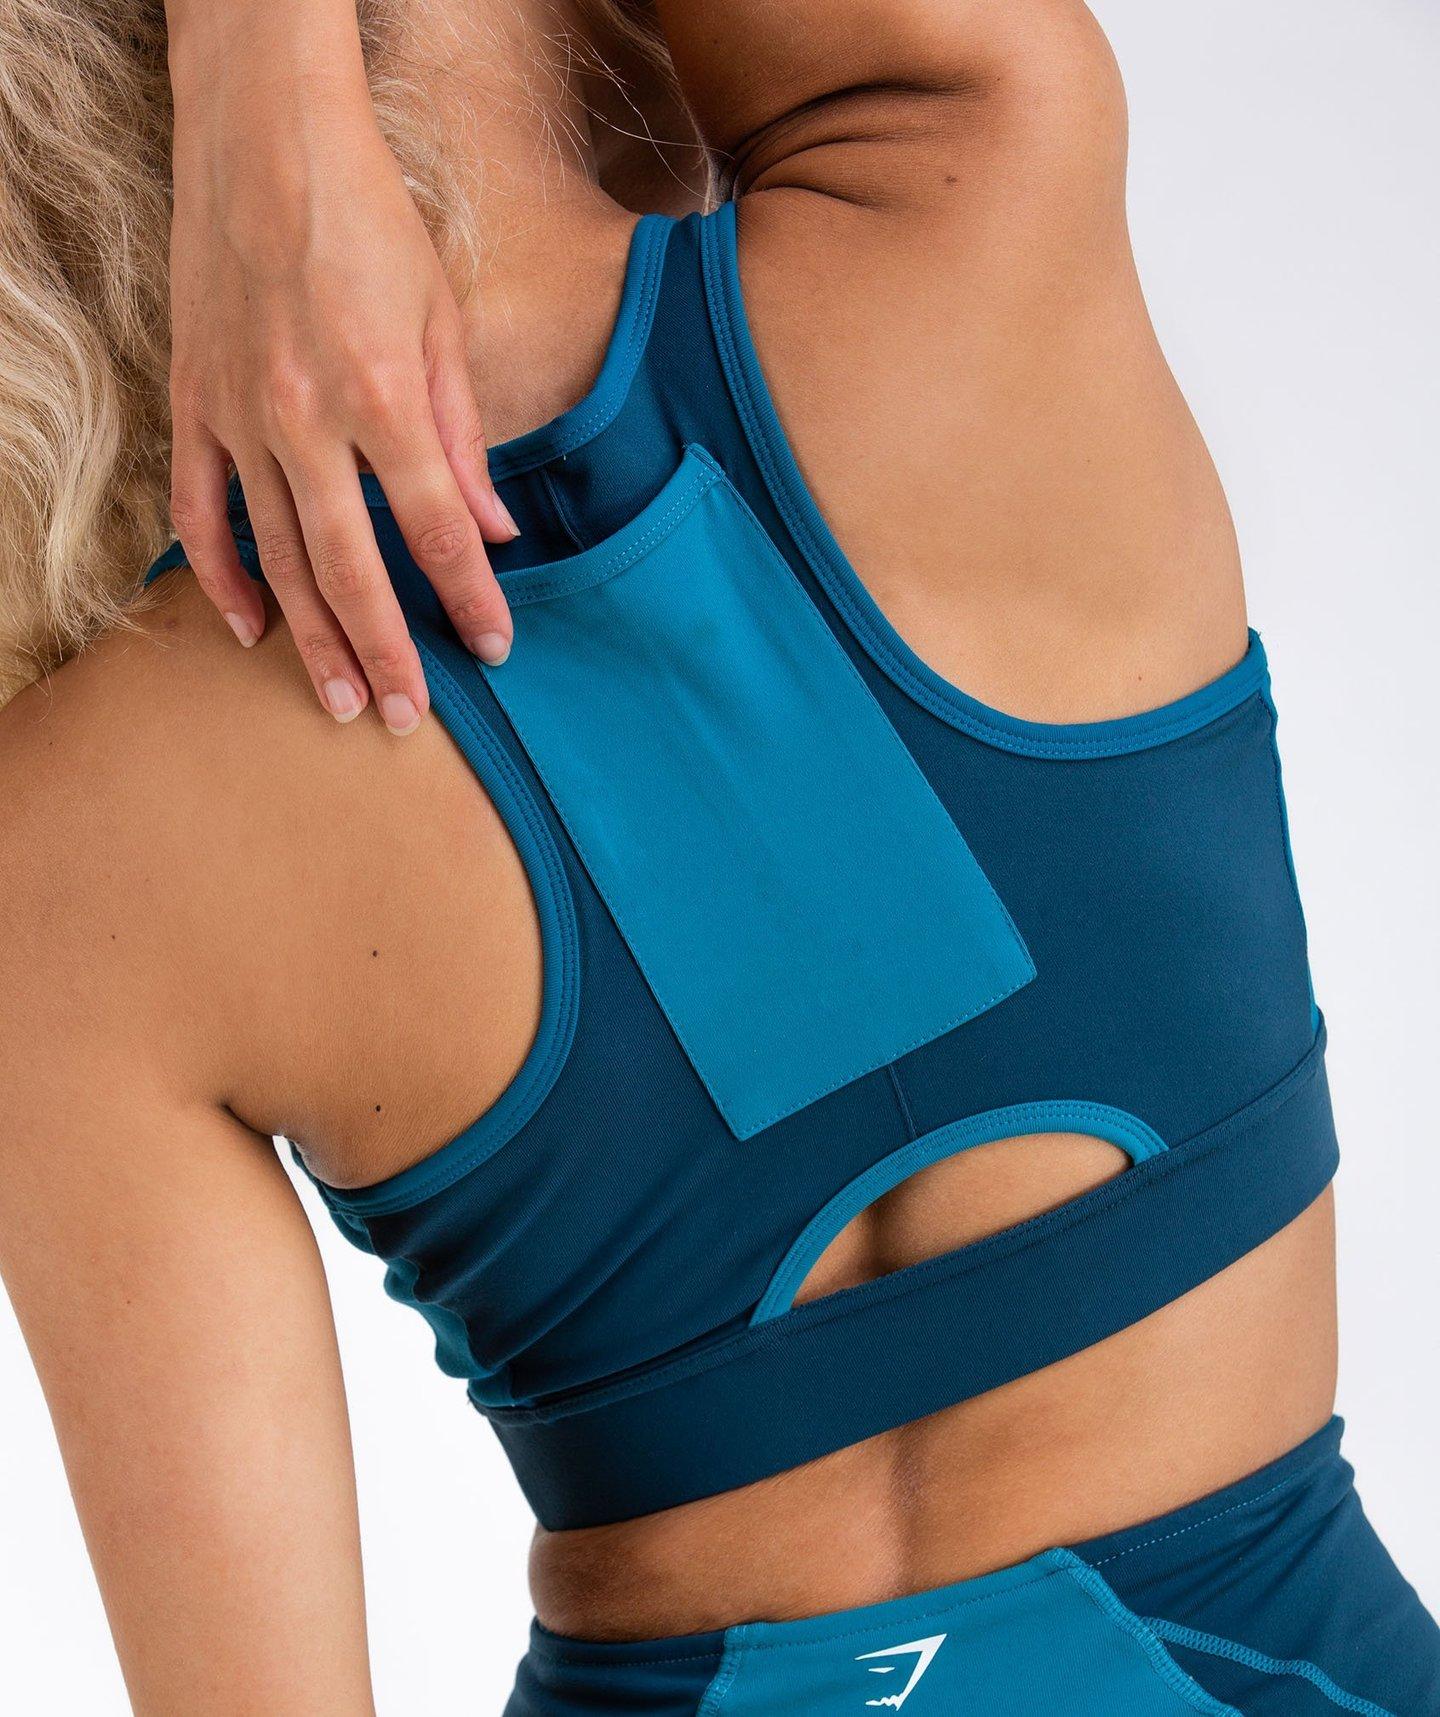 best sports bras with pockets